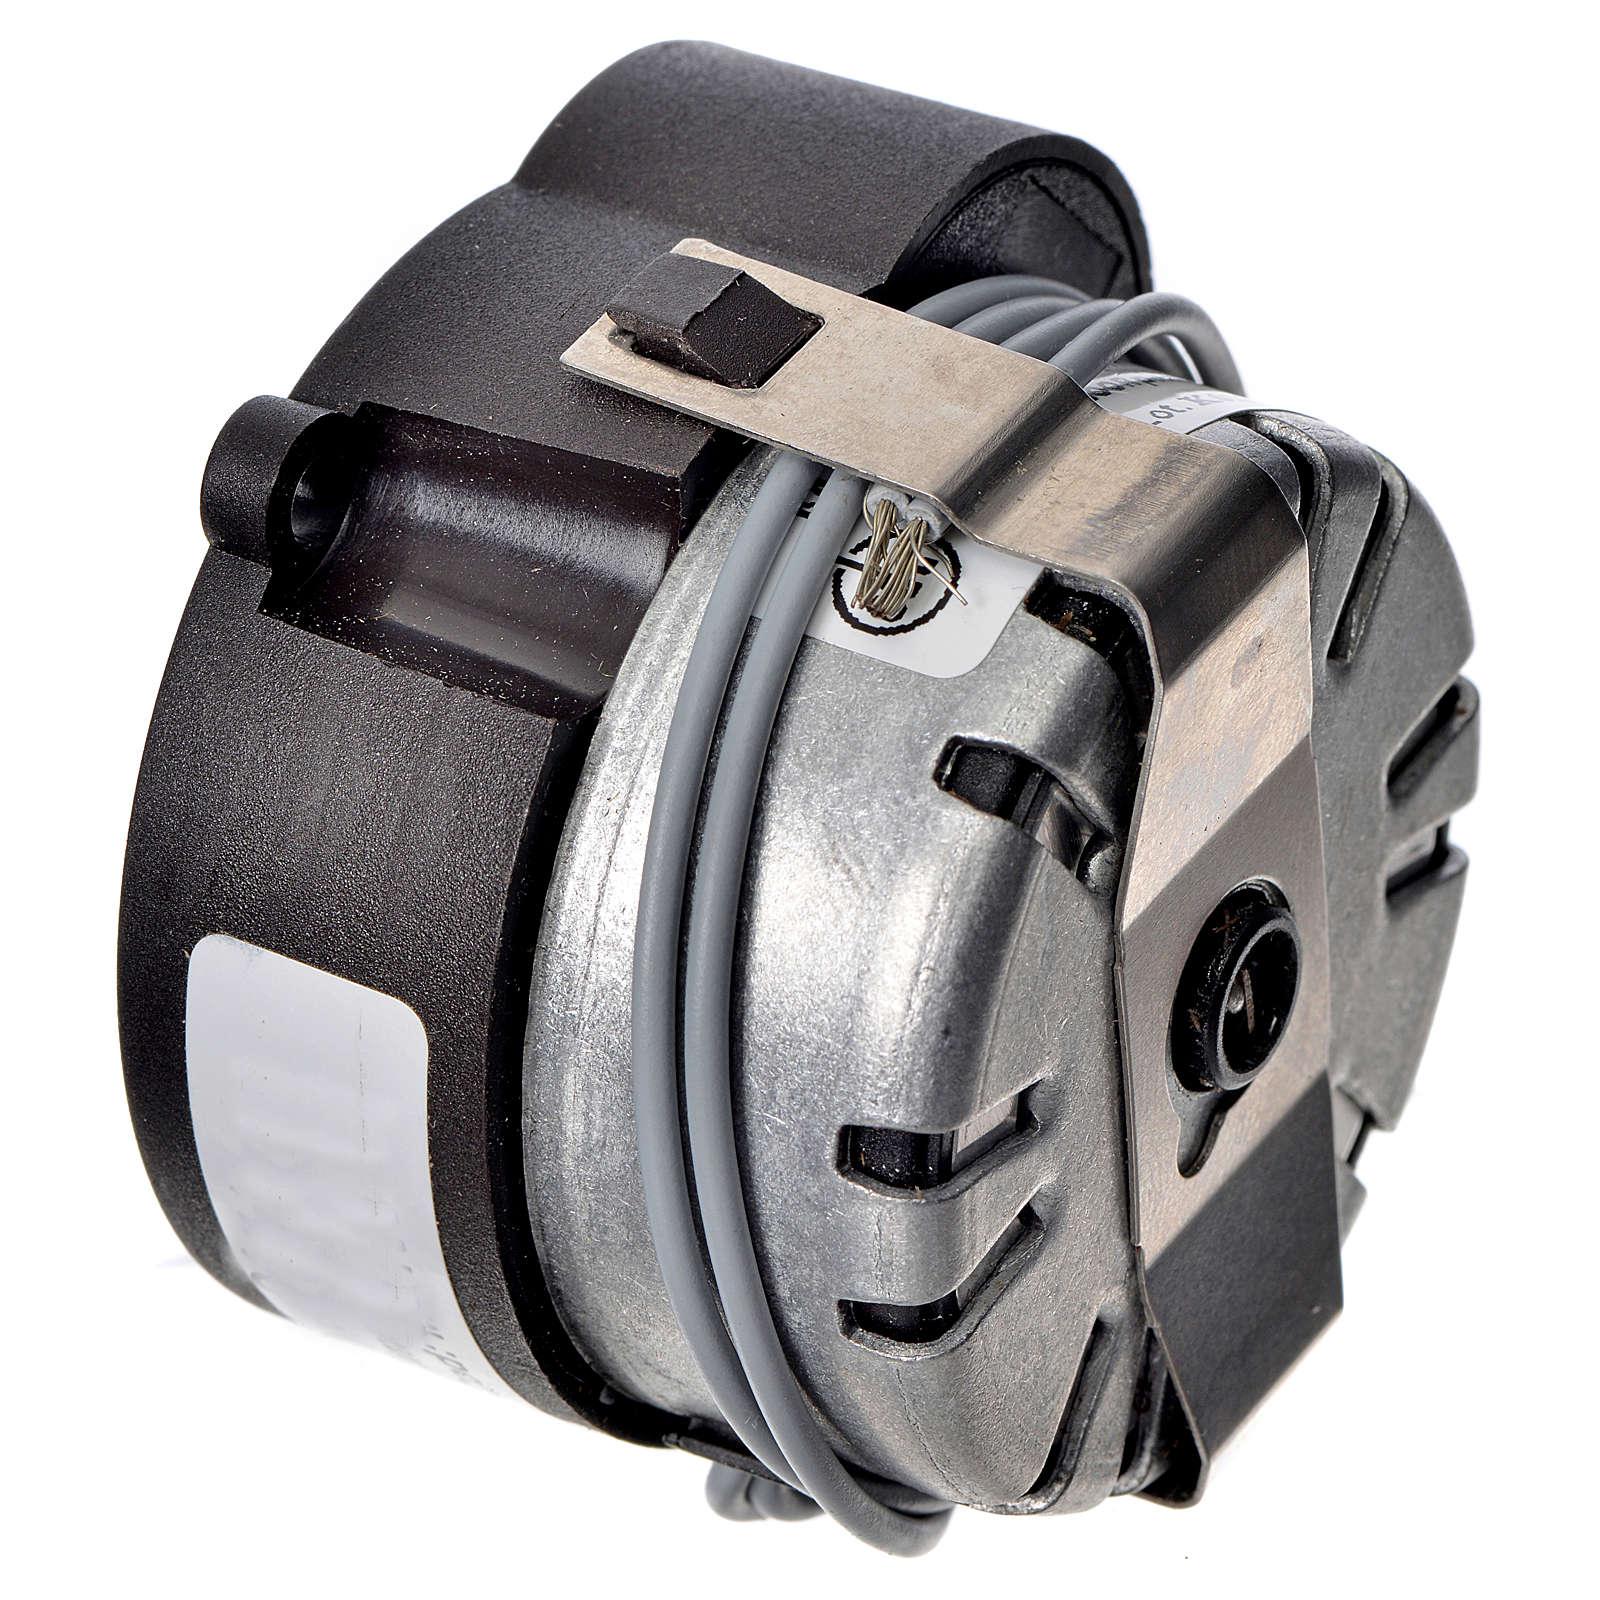 Motoriduttore presepe  MR giri/minuto 15 4